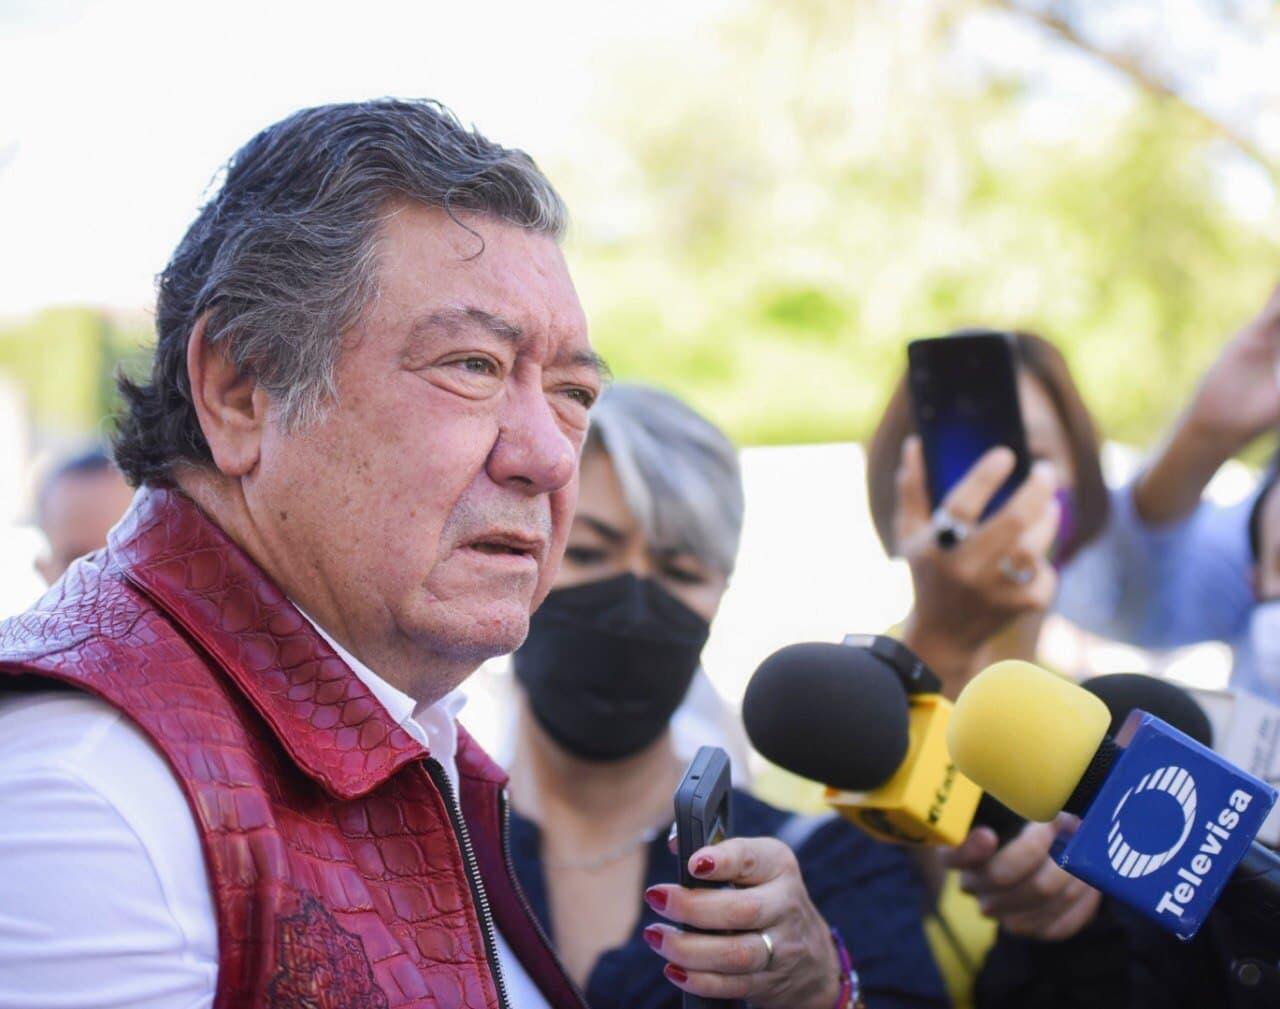 PRESENTA JORGE HANK PROYECTO DE OBRA PÚBLICA PARA SANTA FE